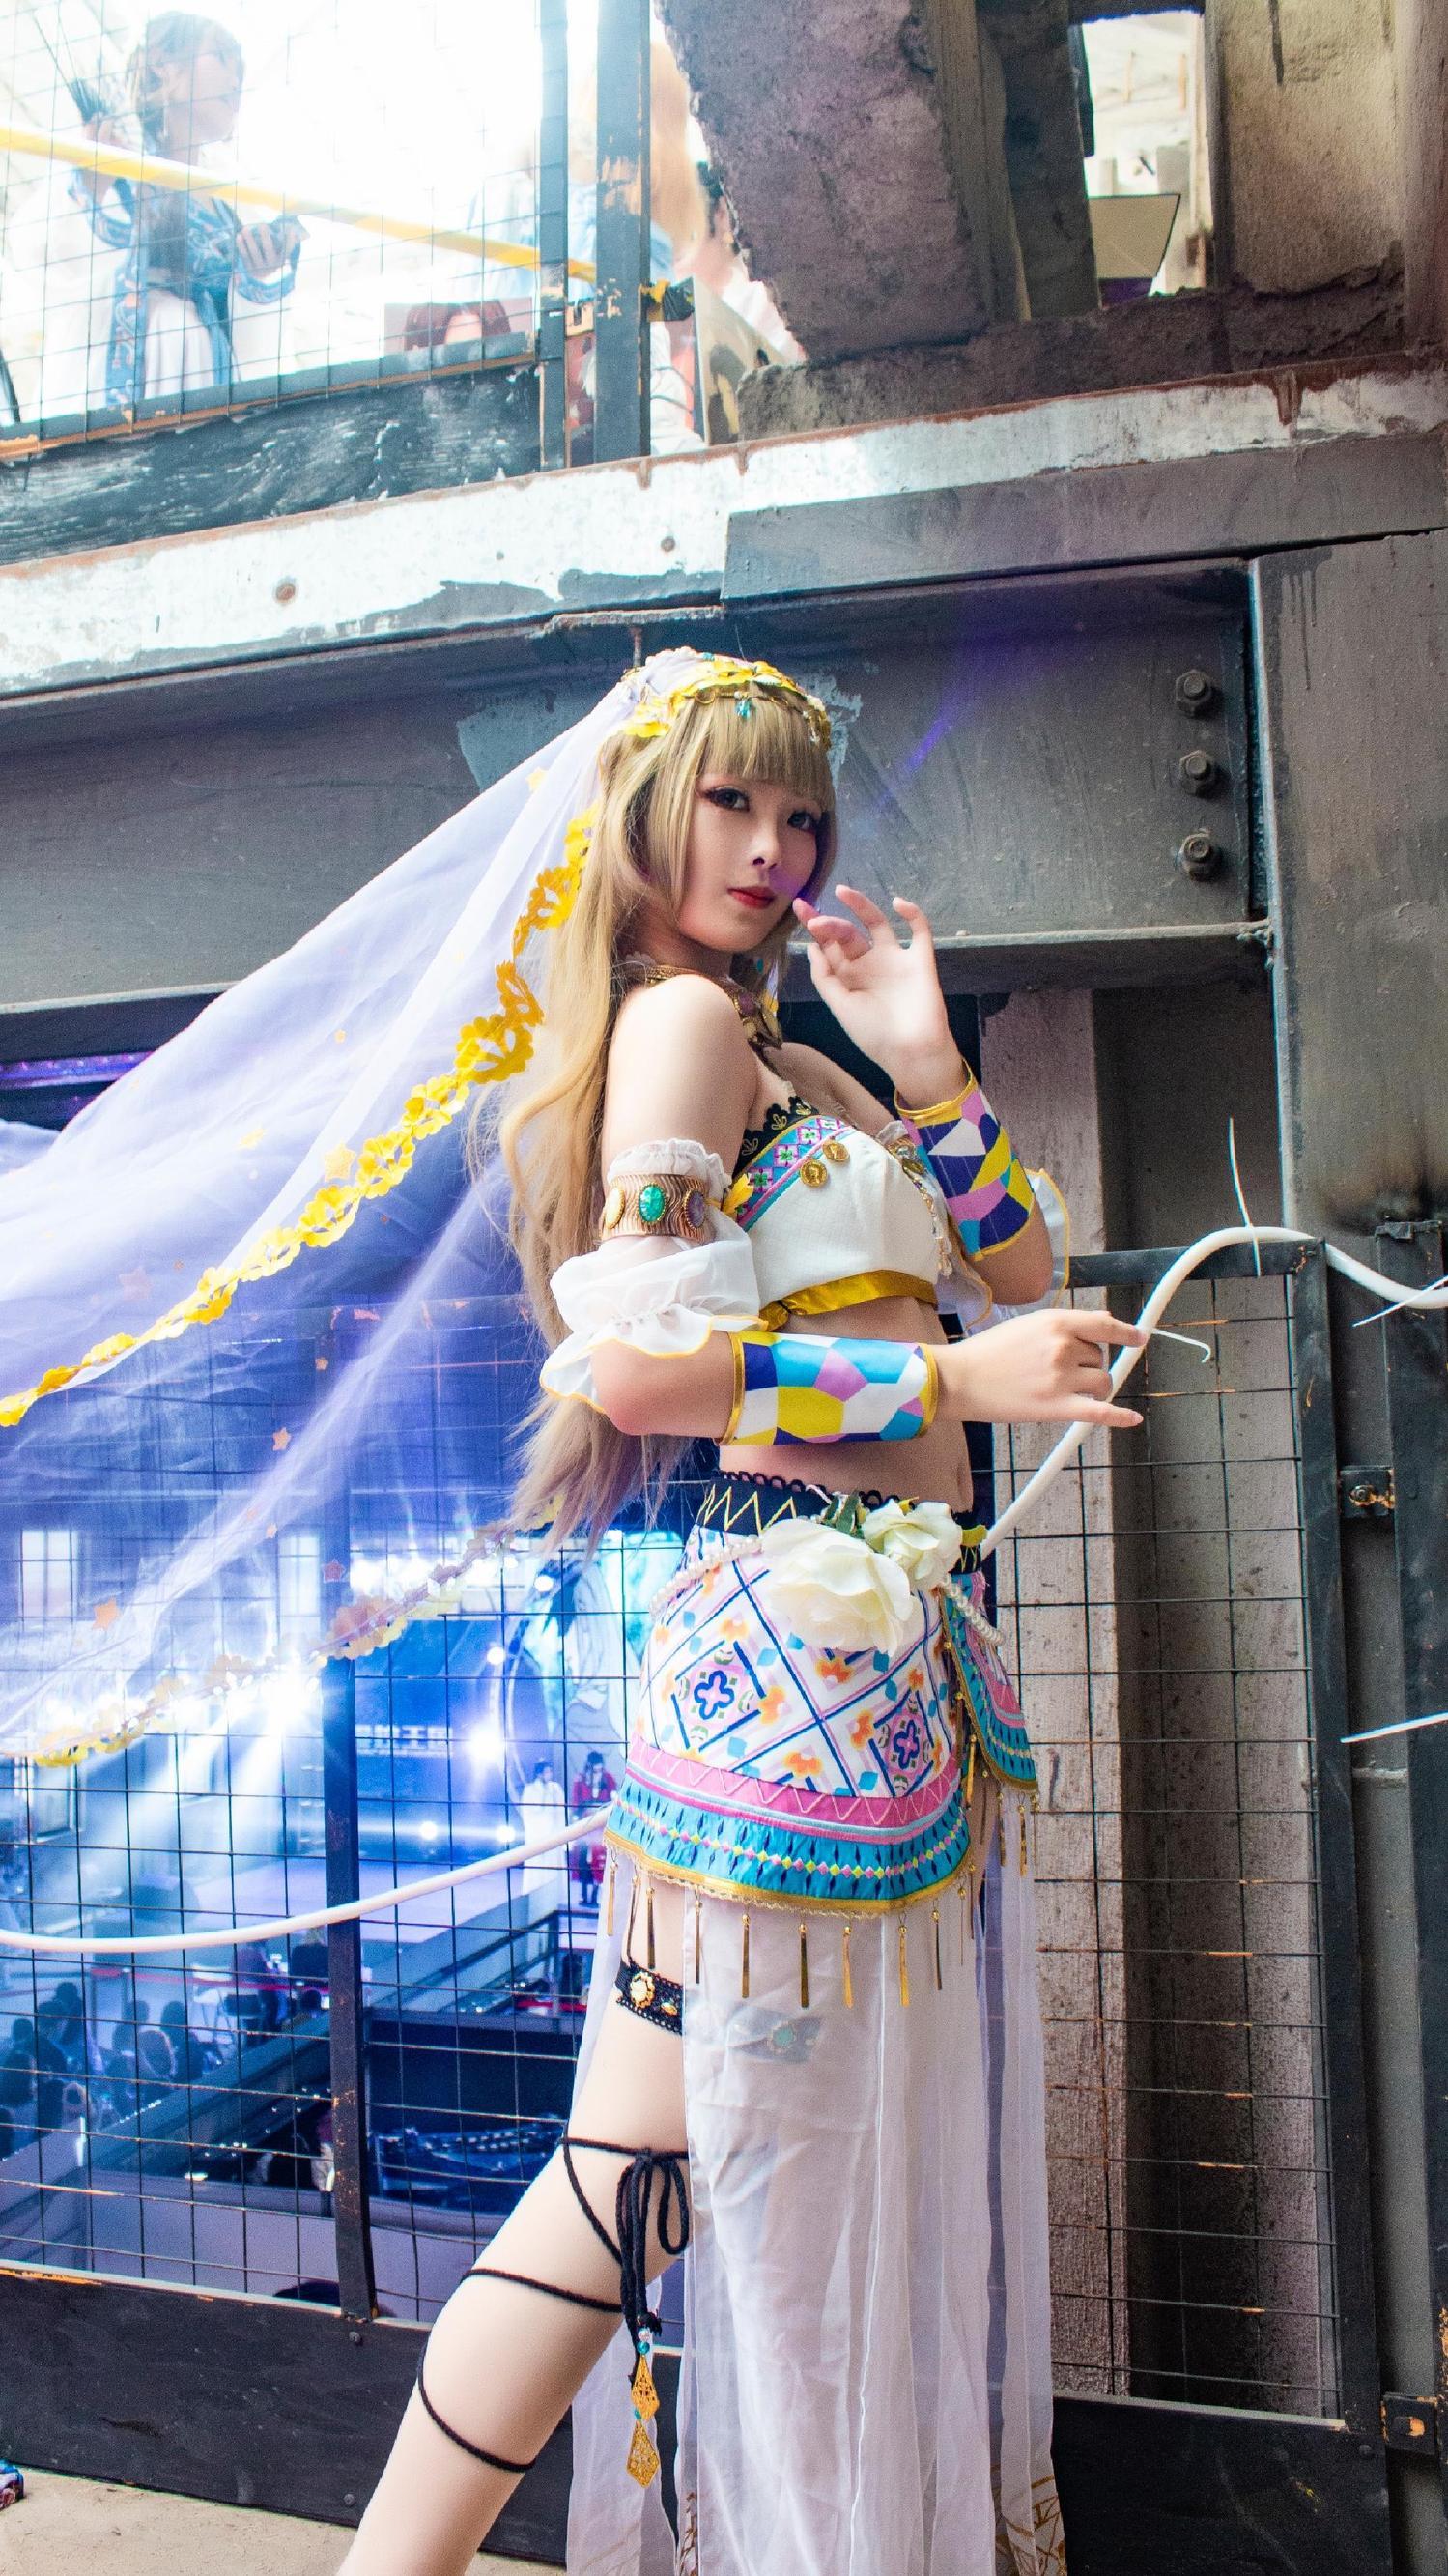 《LOVE LIVE!》漫展cosplay【CN:亦遥_林梓晕3D】-第6张